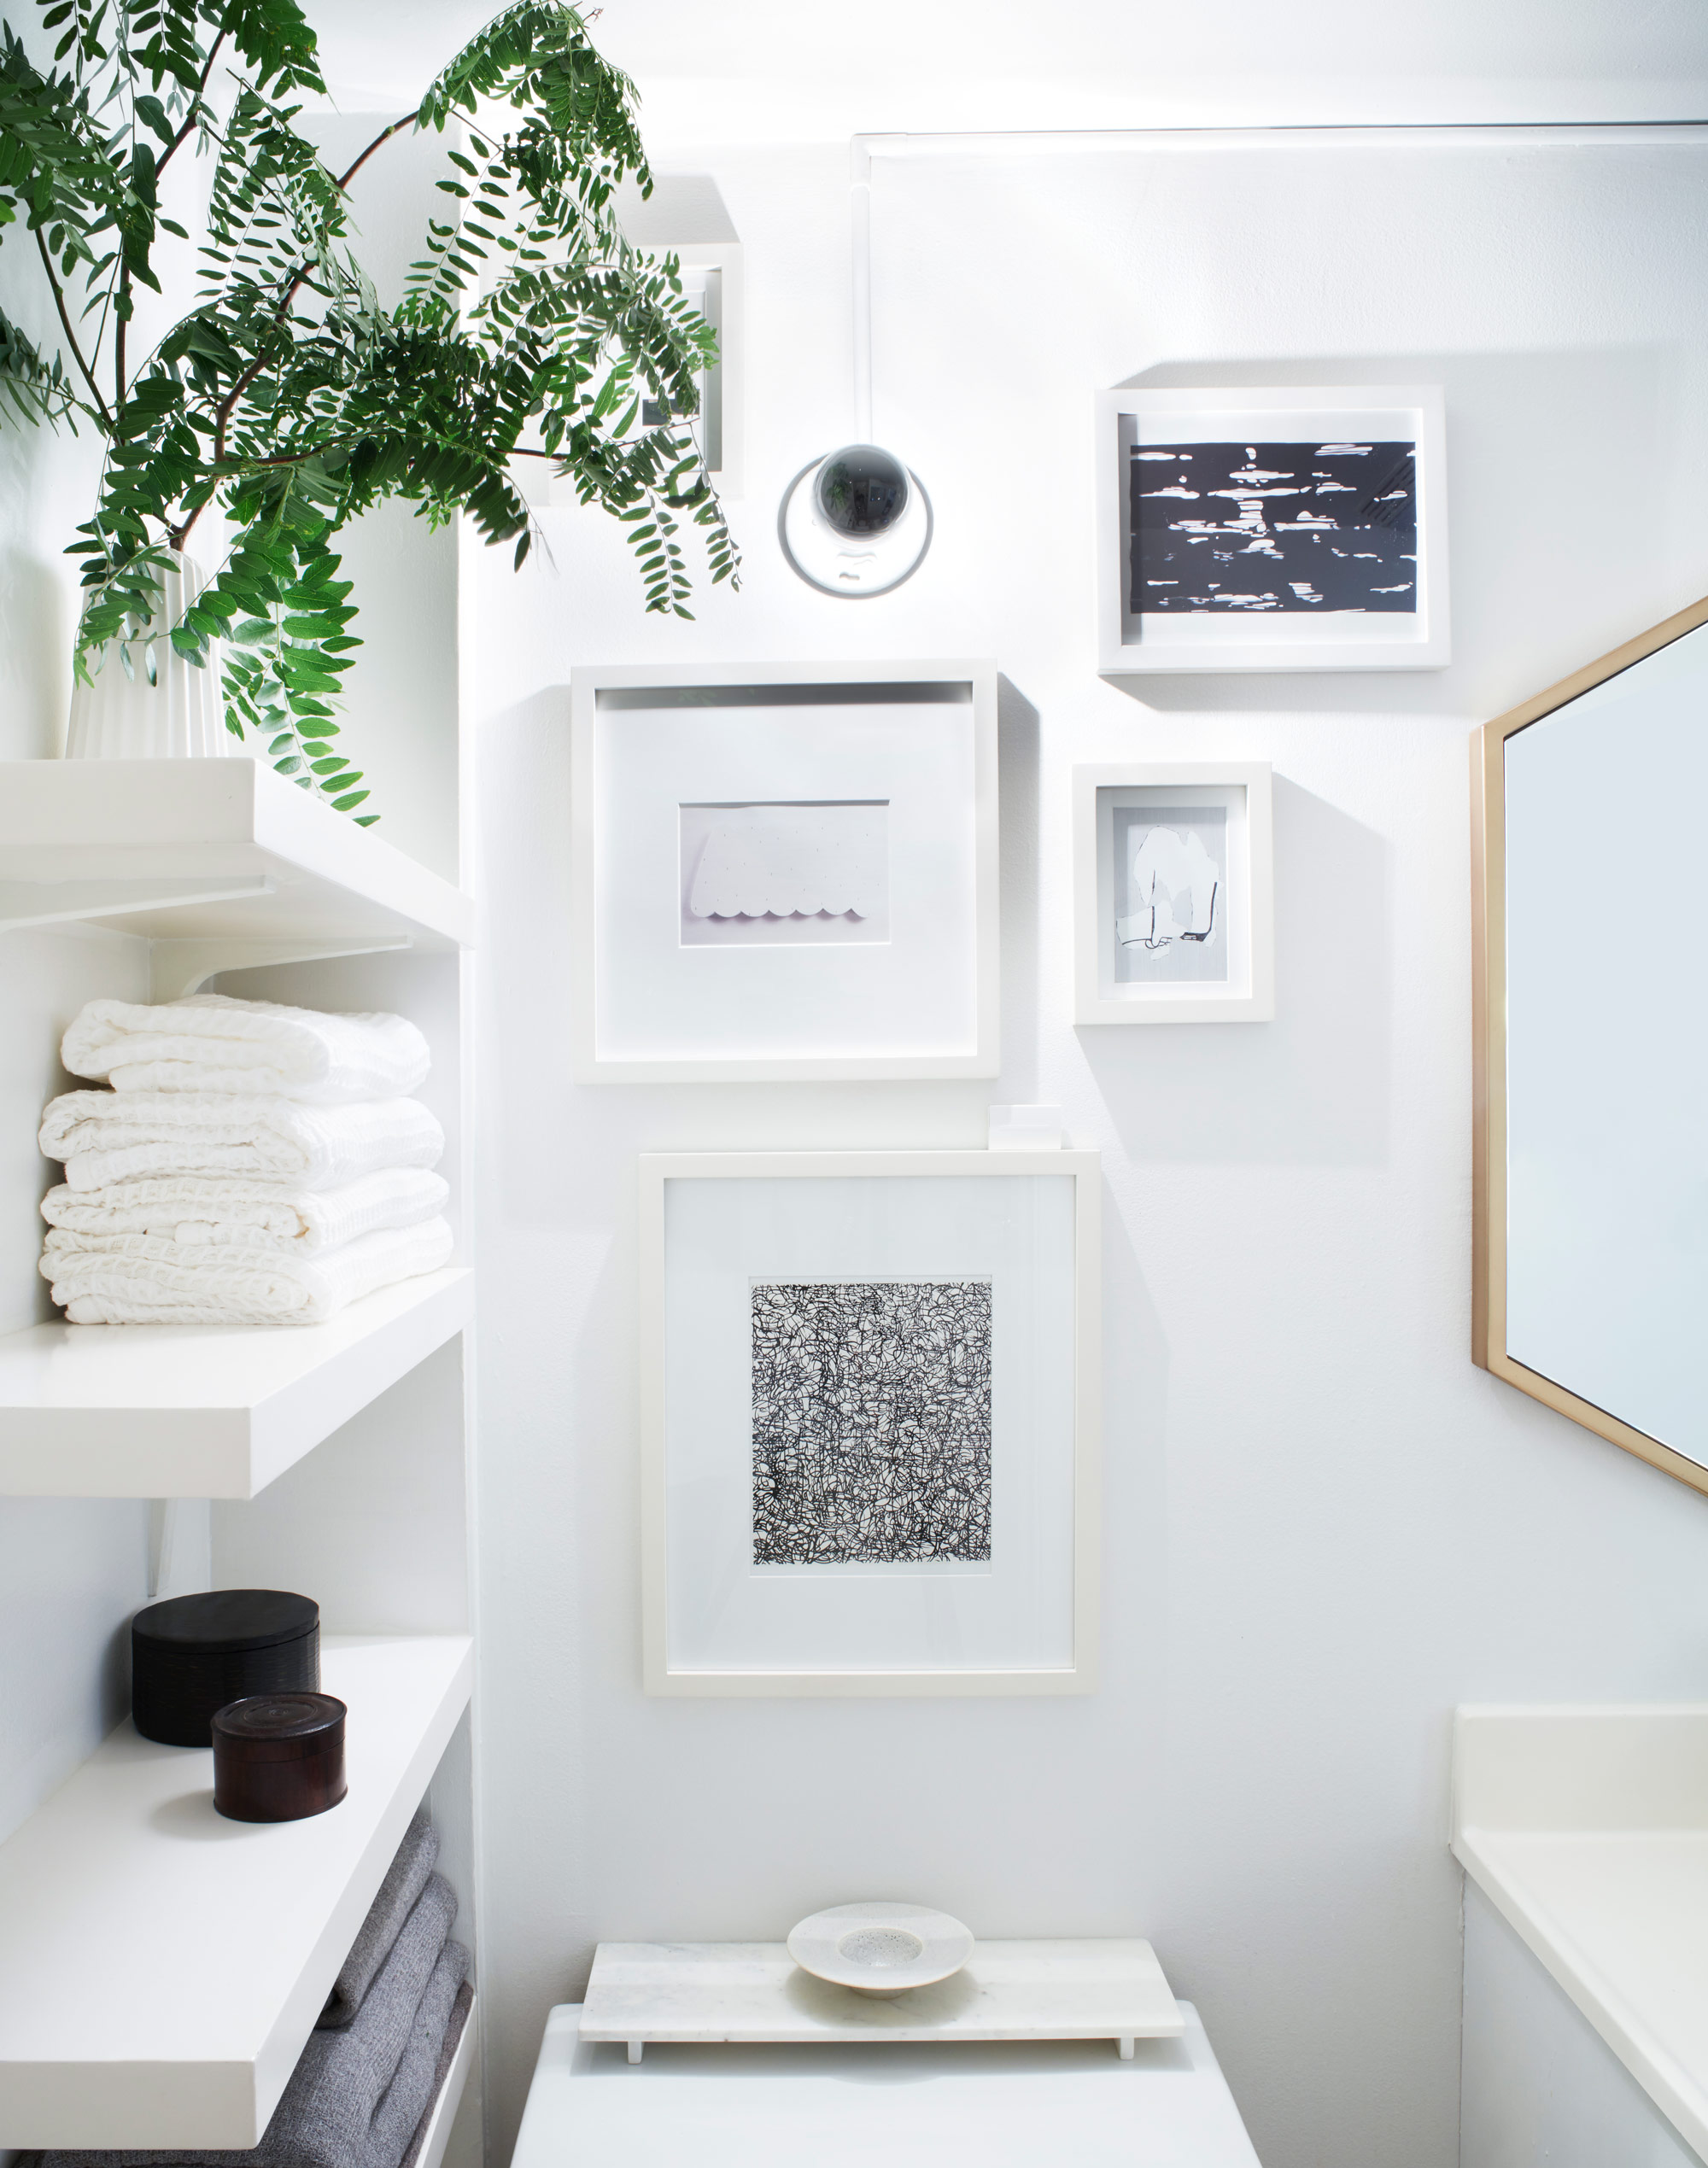 Laura-Cattano-bathroom-art.jpg